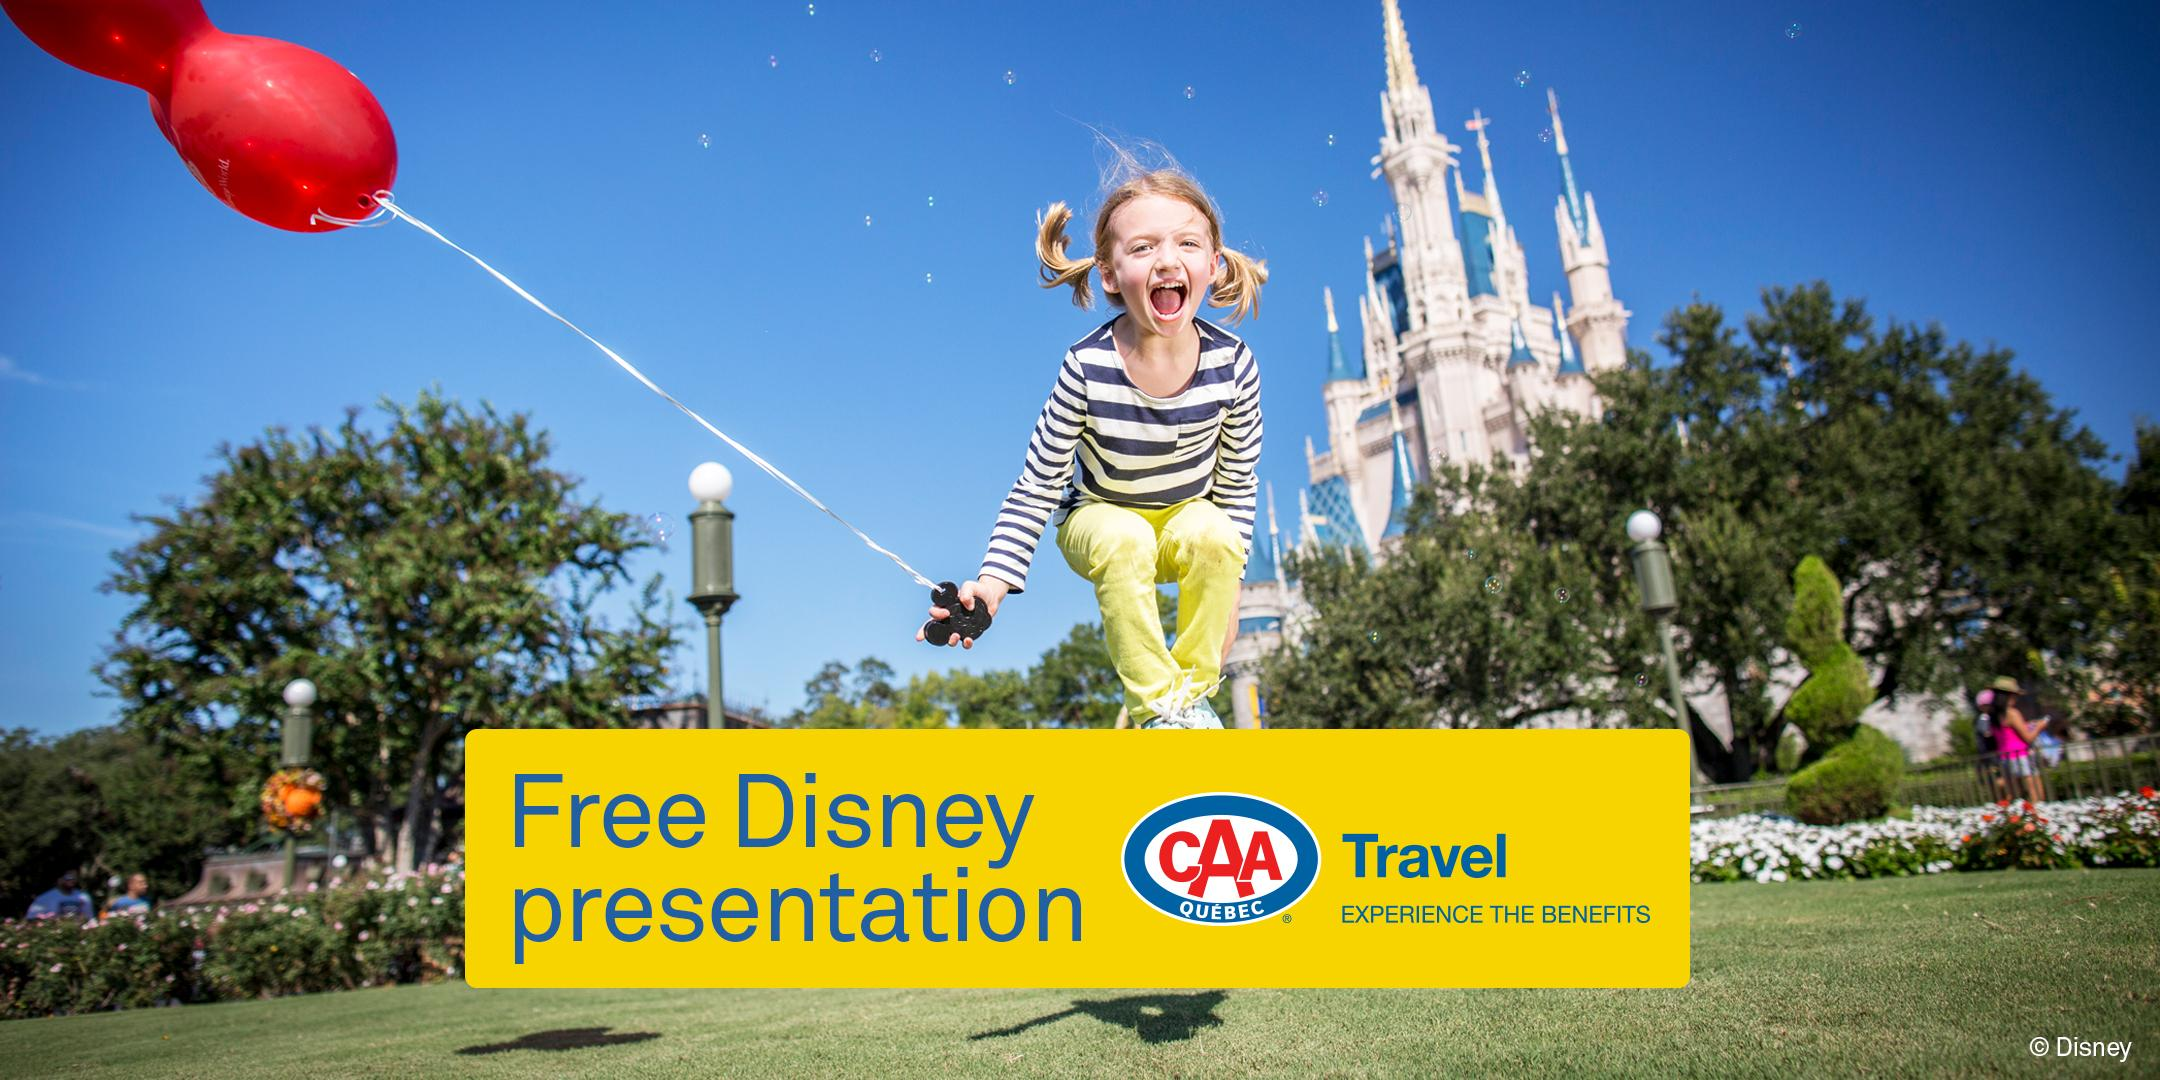 CAA-Quebec travel presentation in Pointe-Claire